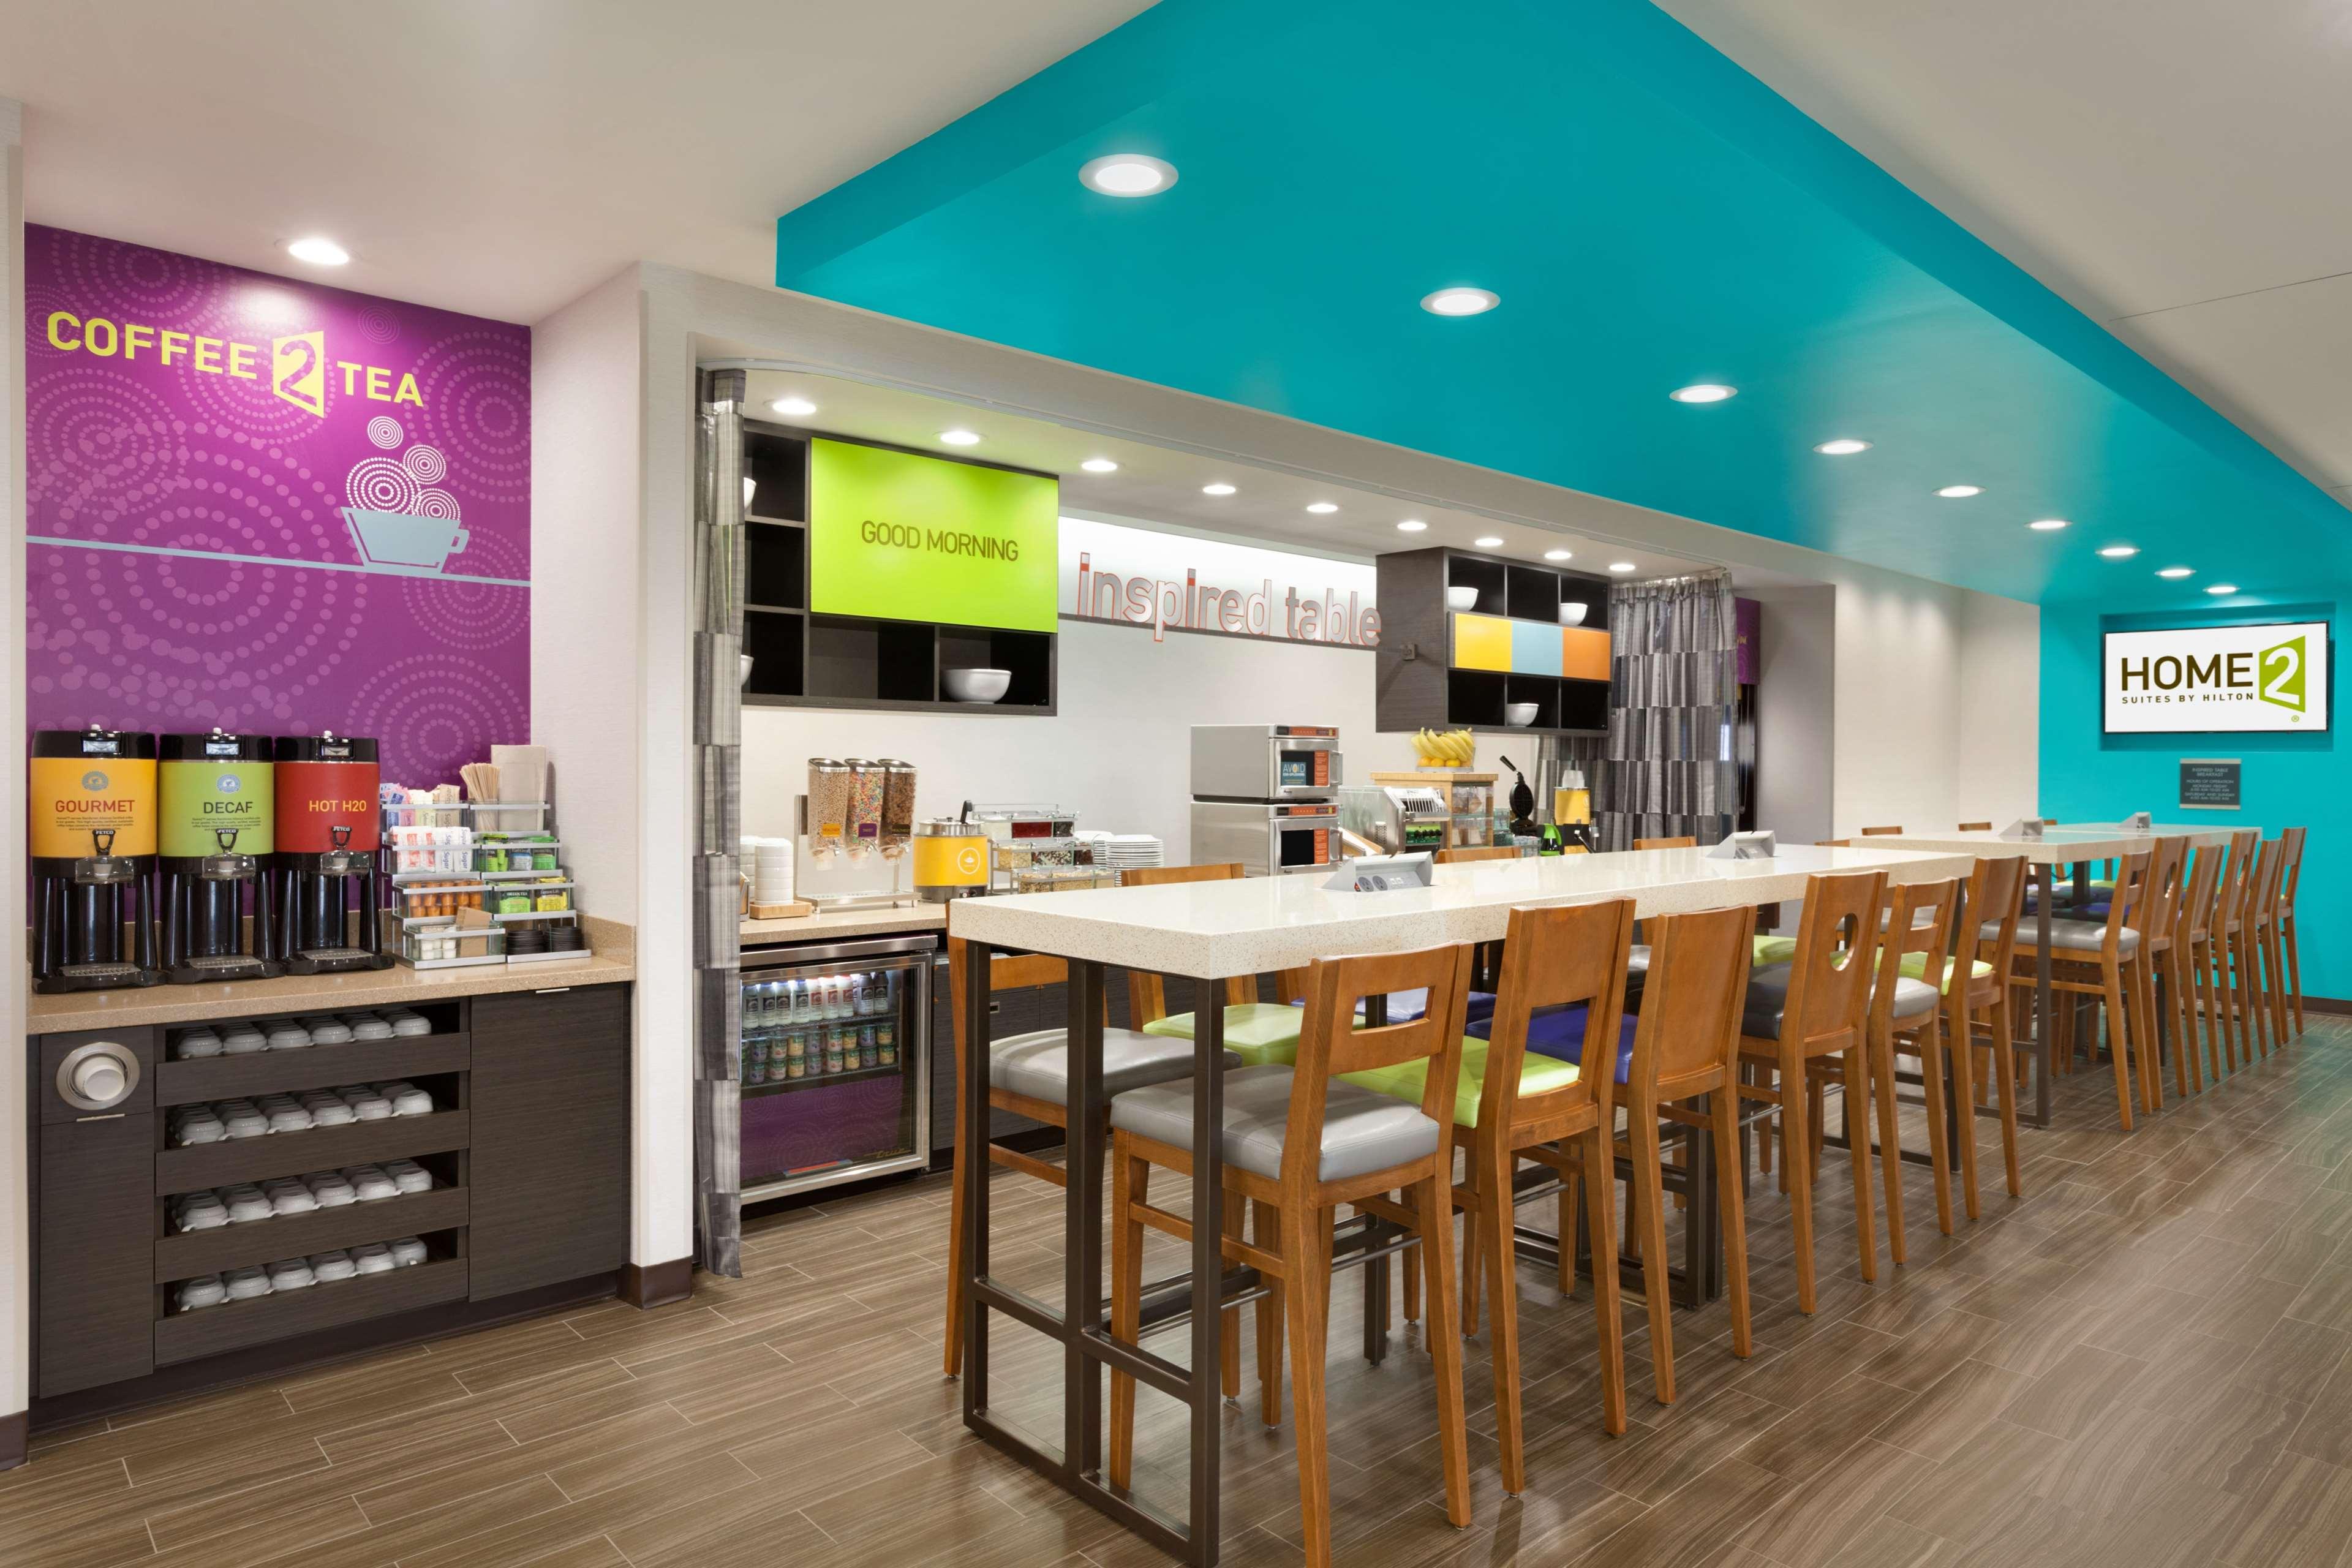 Home2 Suites by Hilton West Monroe image 6